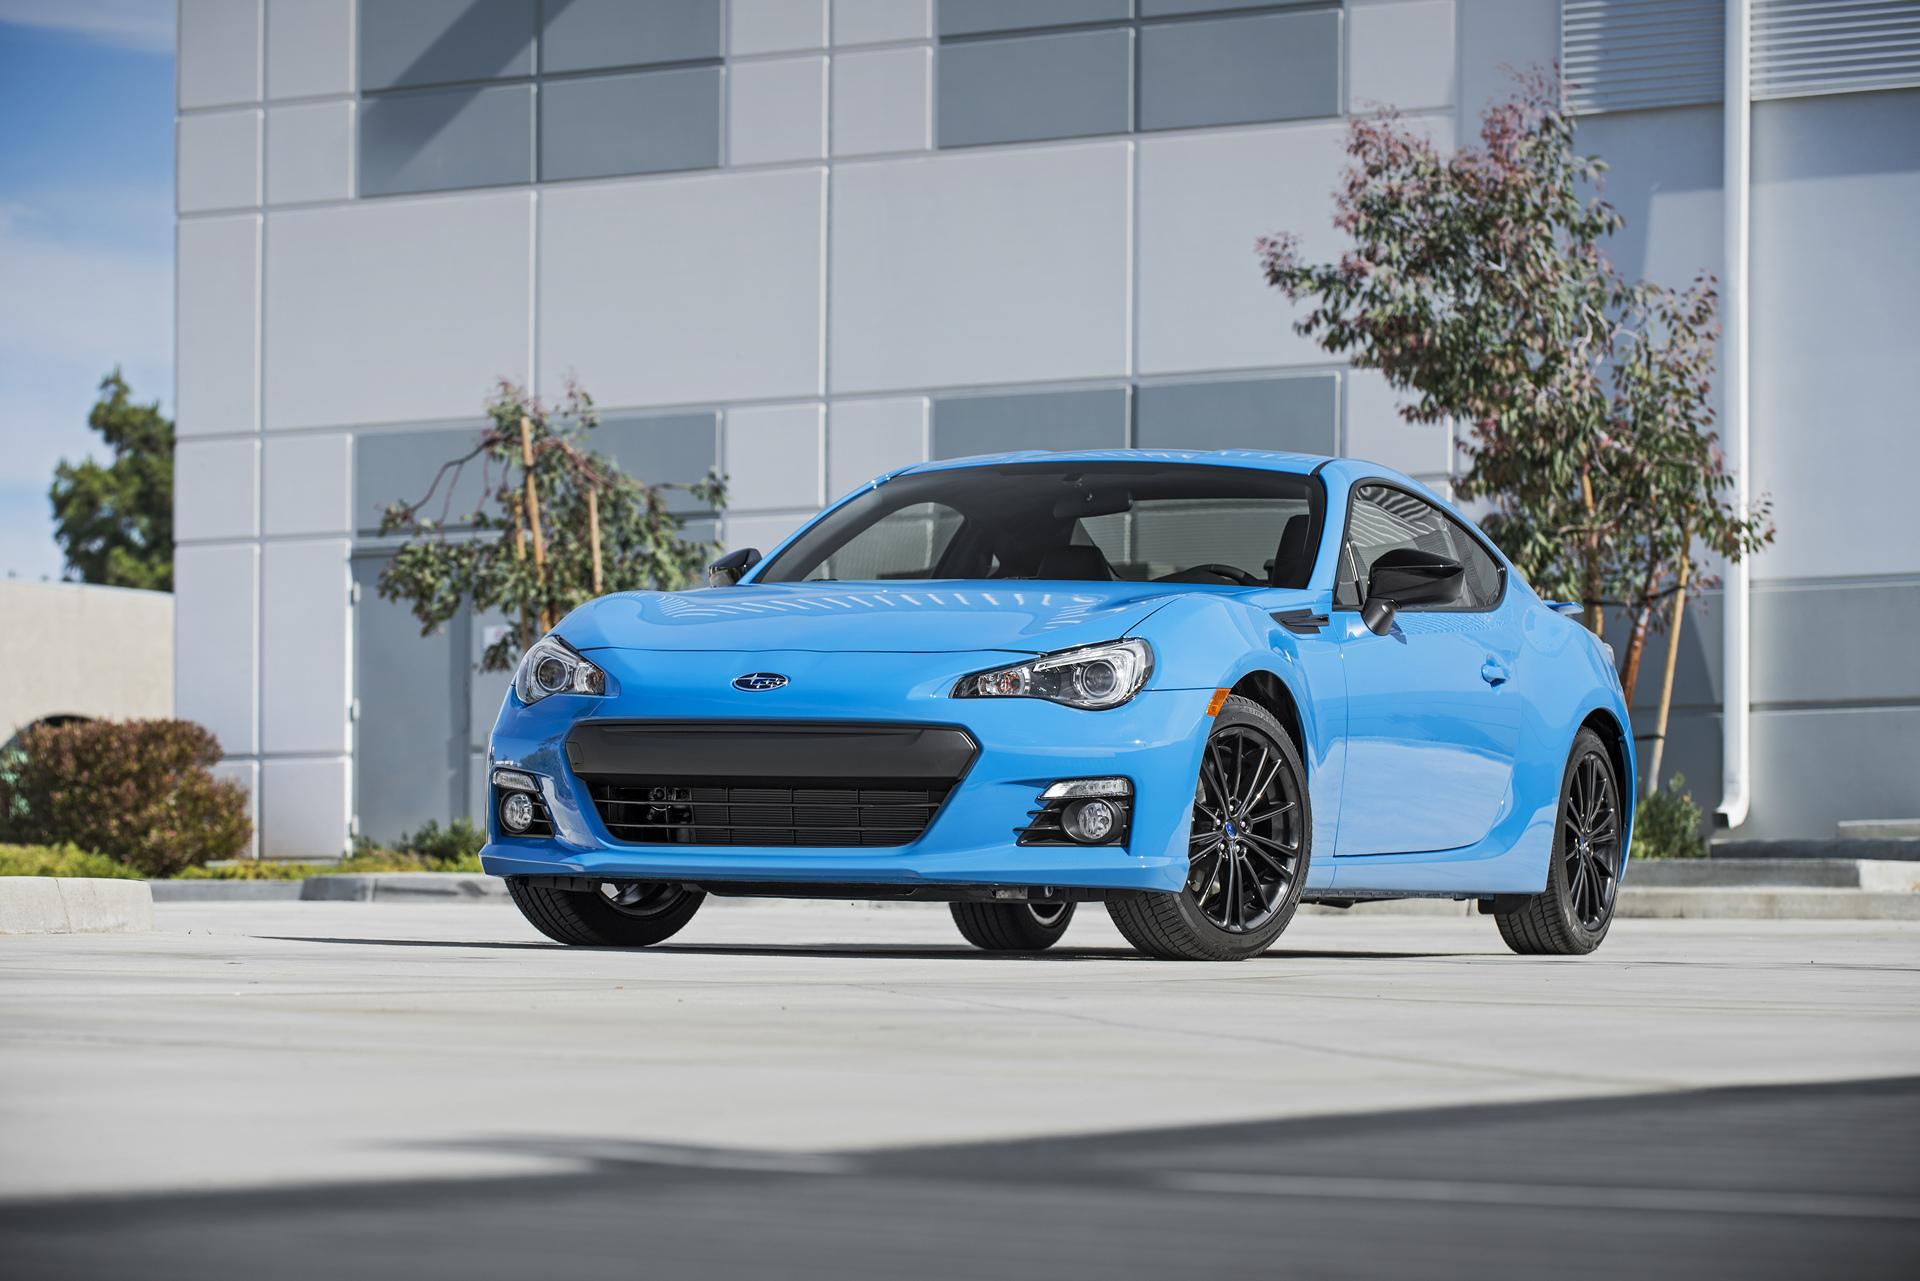 2016 Subaru Brz Review Carrrs Auto Portal